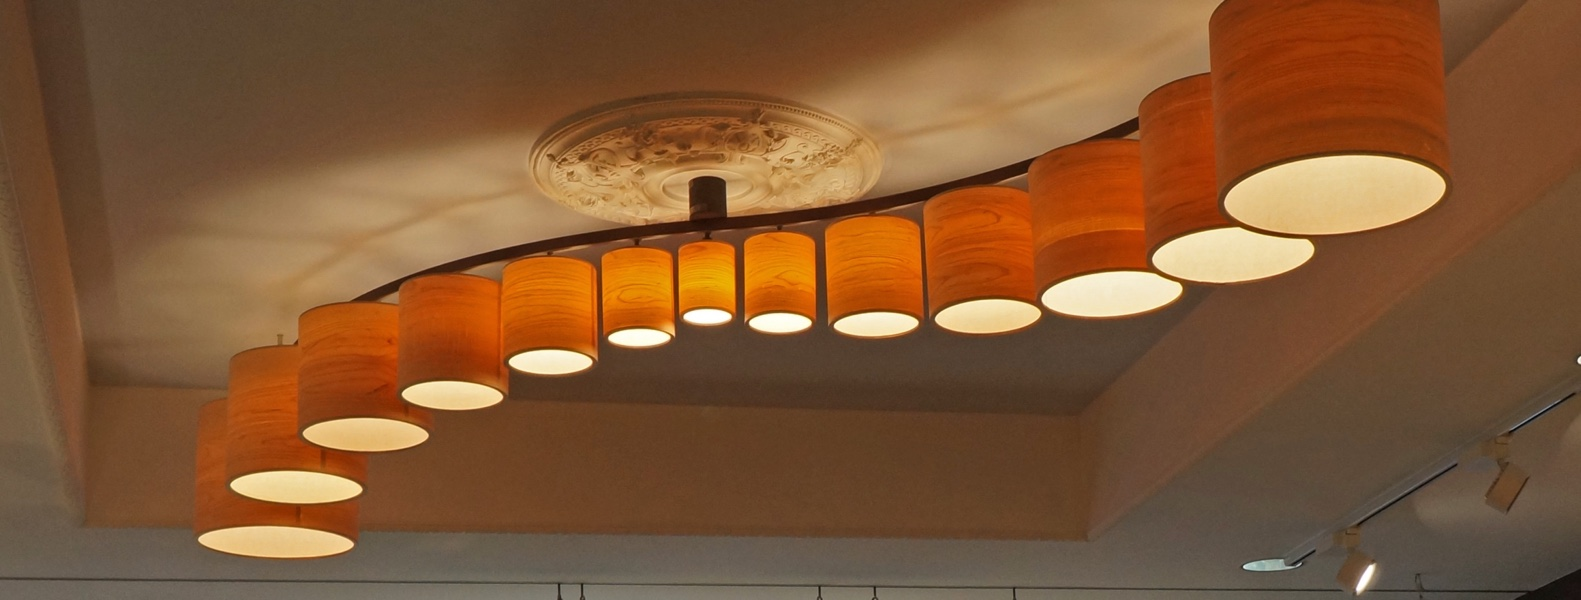 design verlichting solden